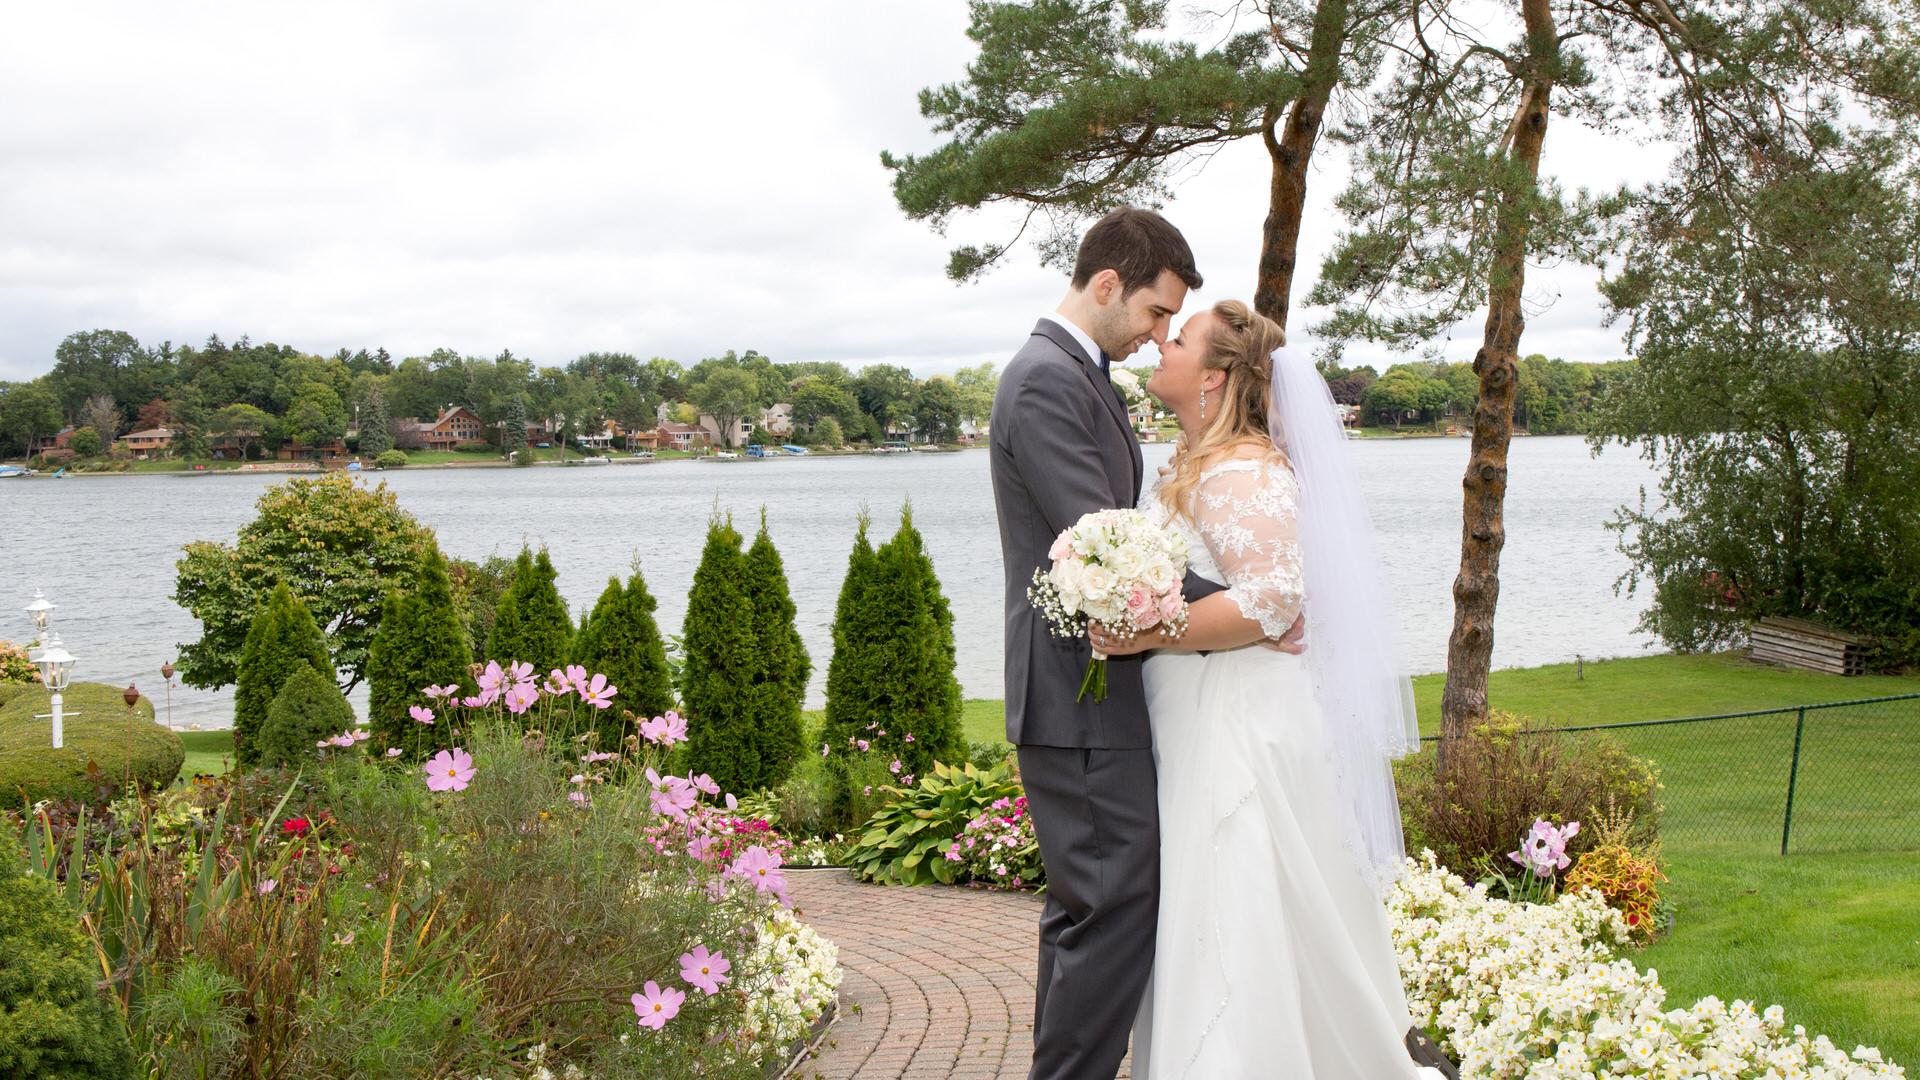 Vanessa & Michel @ Victoria Wedding Chapel in Waterford, Michigan